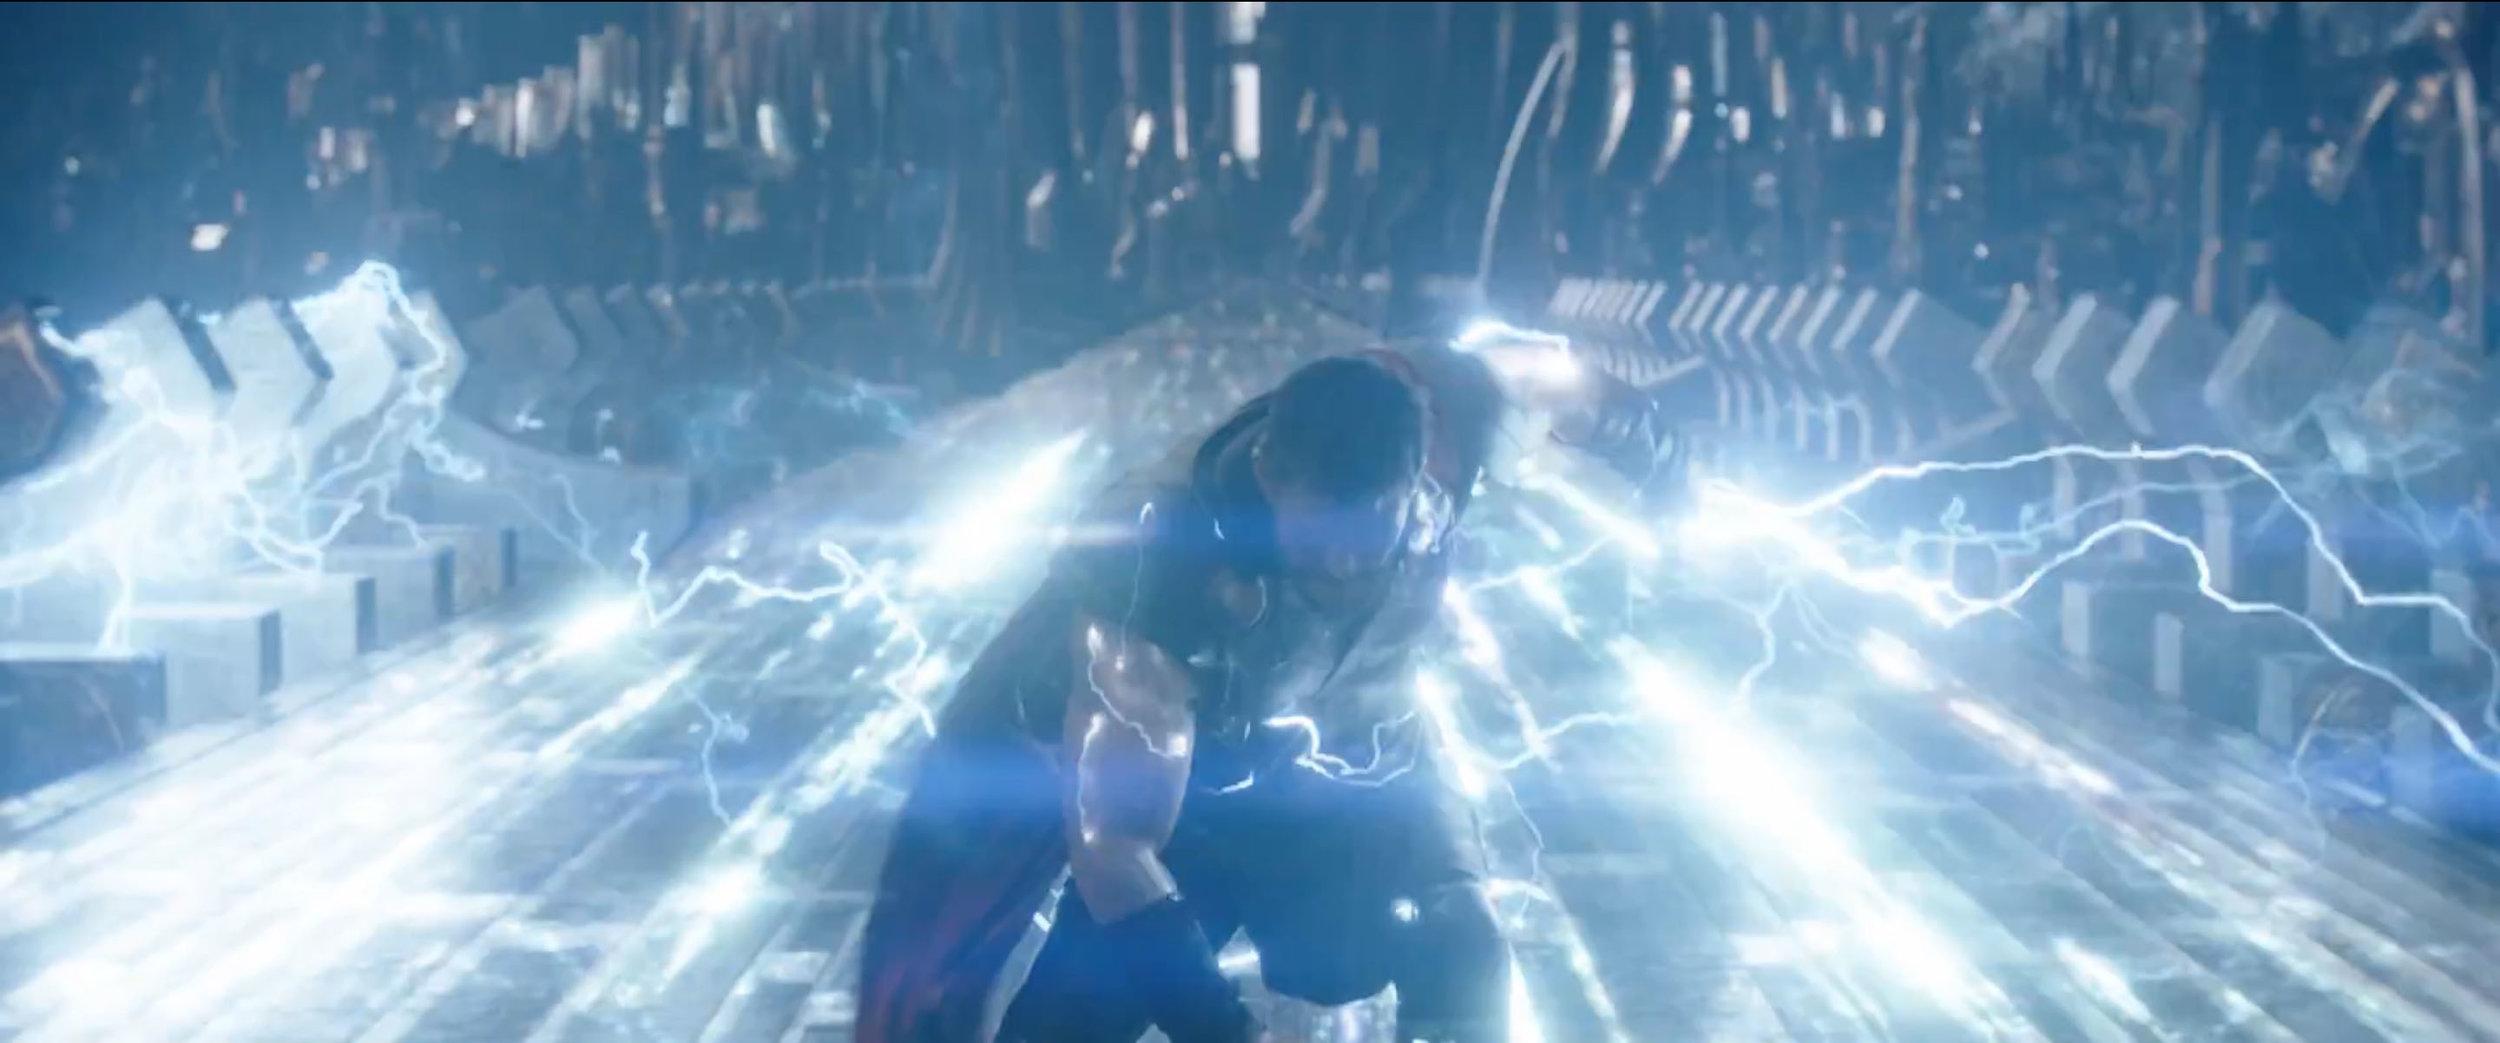 Thor-Ragnarok-Trailer-2-43.jpg